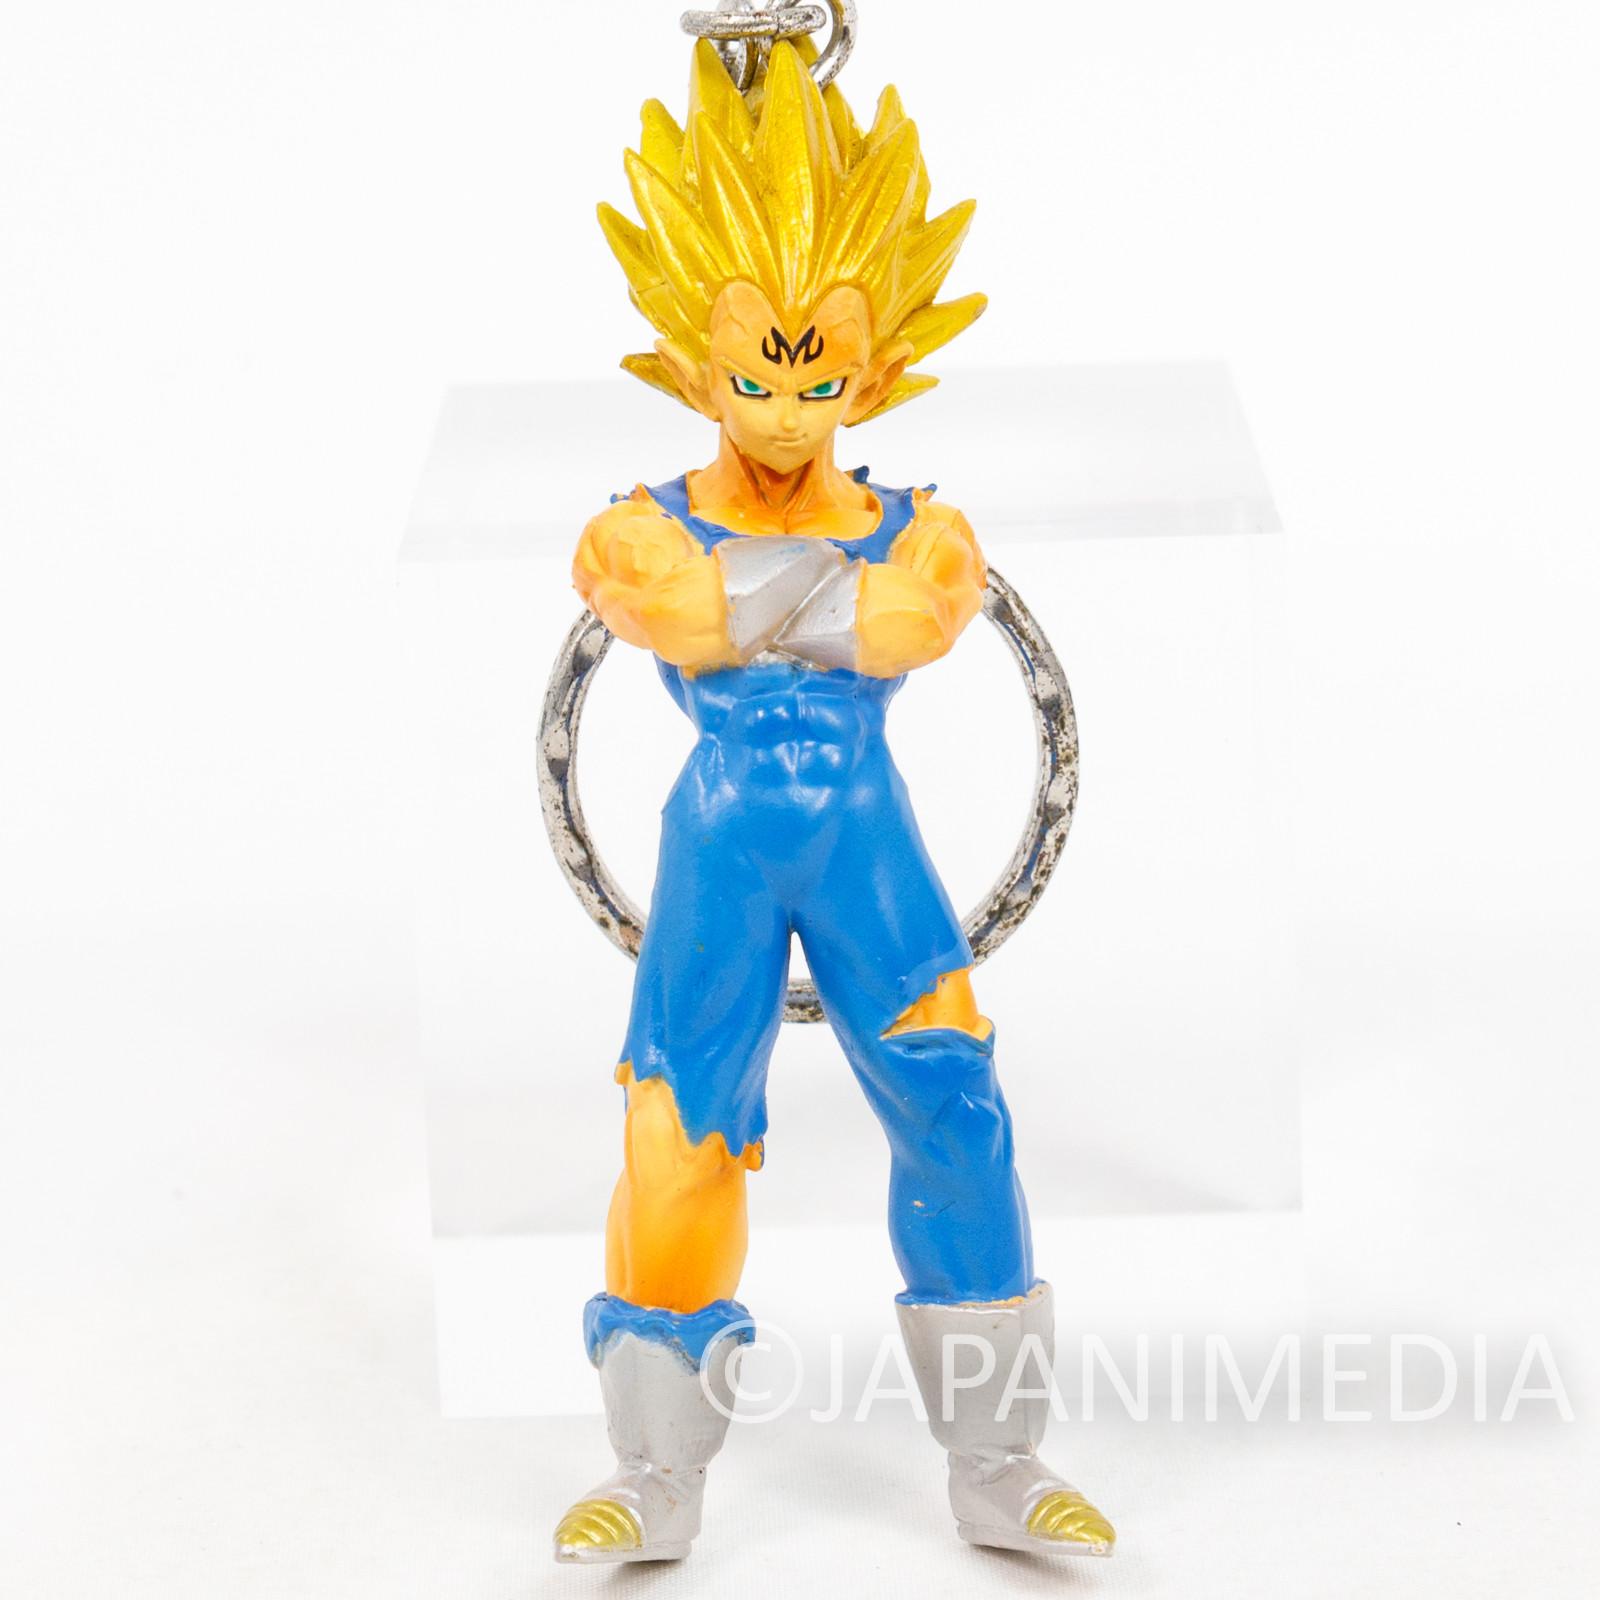 Dragon Ball Z Majin Vegeta Figure Key Chain Holder JAPAN ANIME MANGA